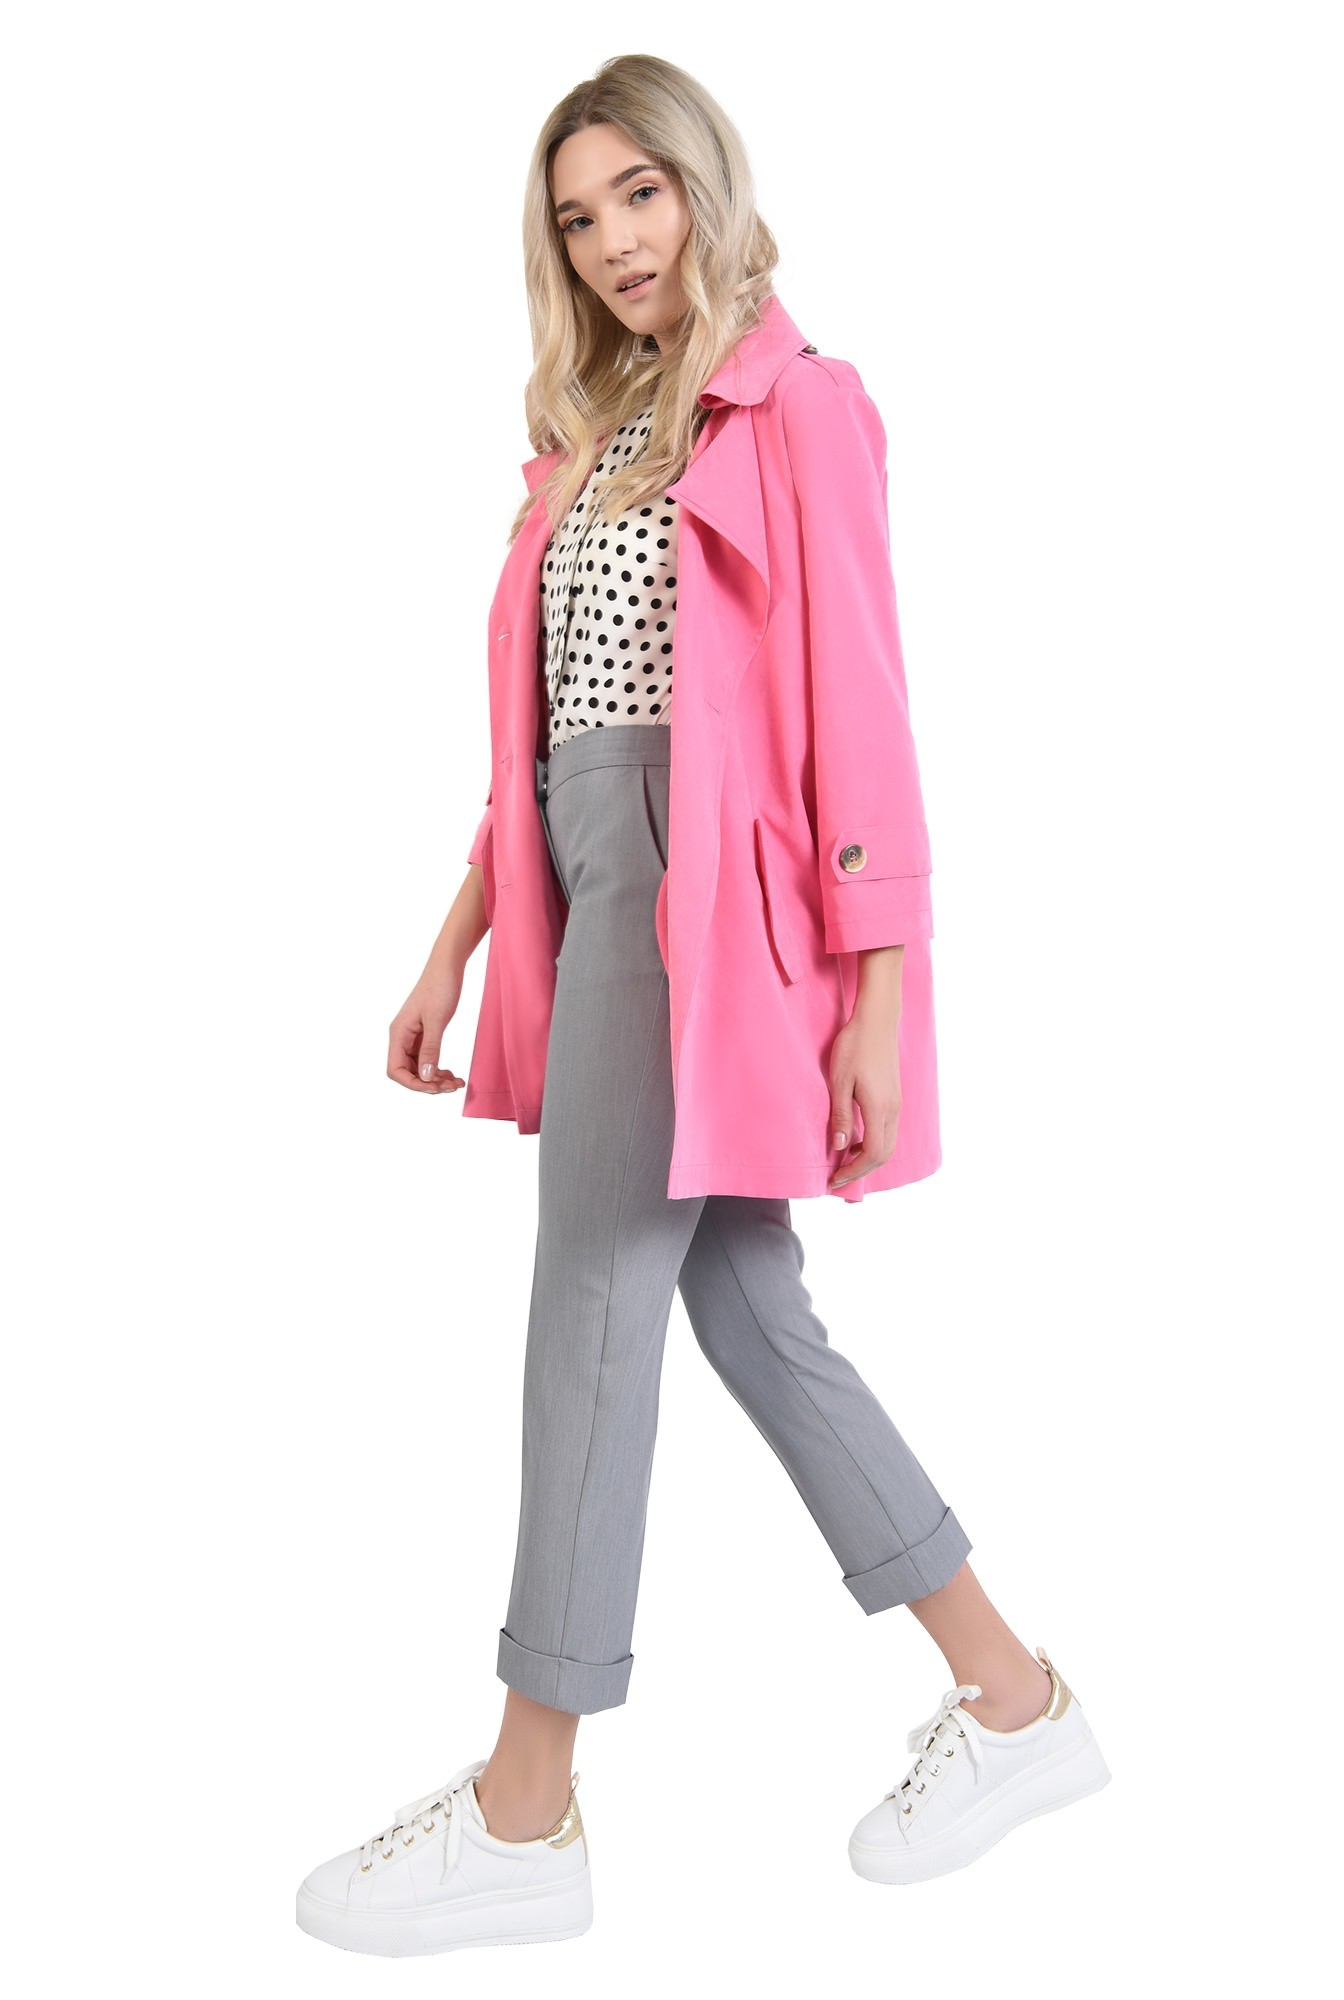 0 - jacheta roz, cu nasturi, cu revere, croi relaxat